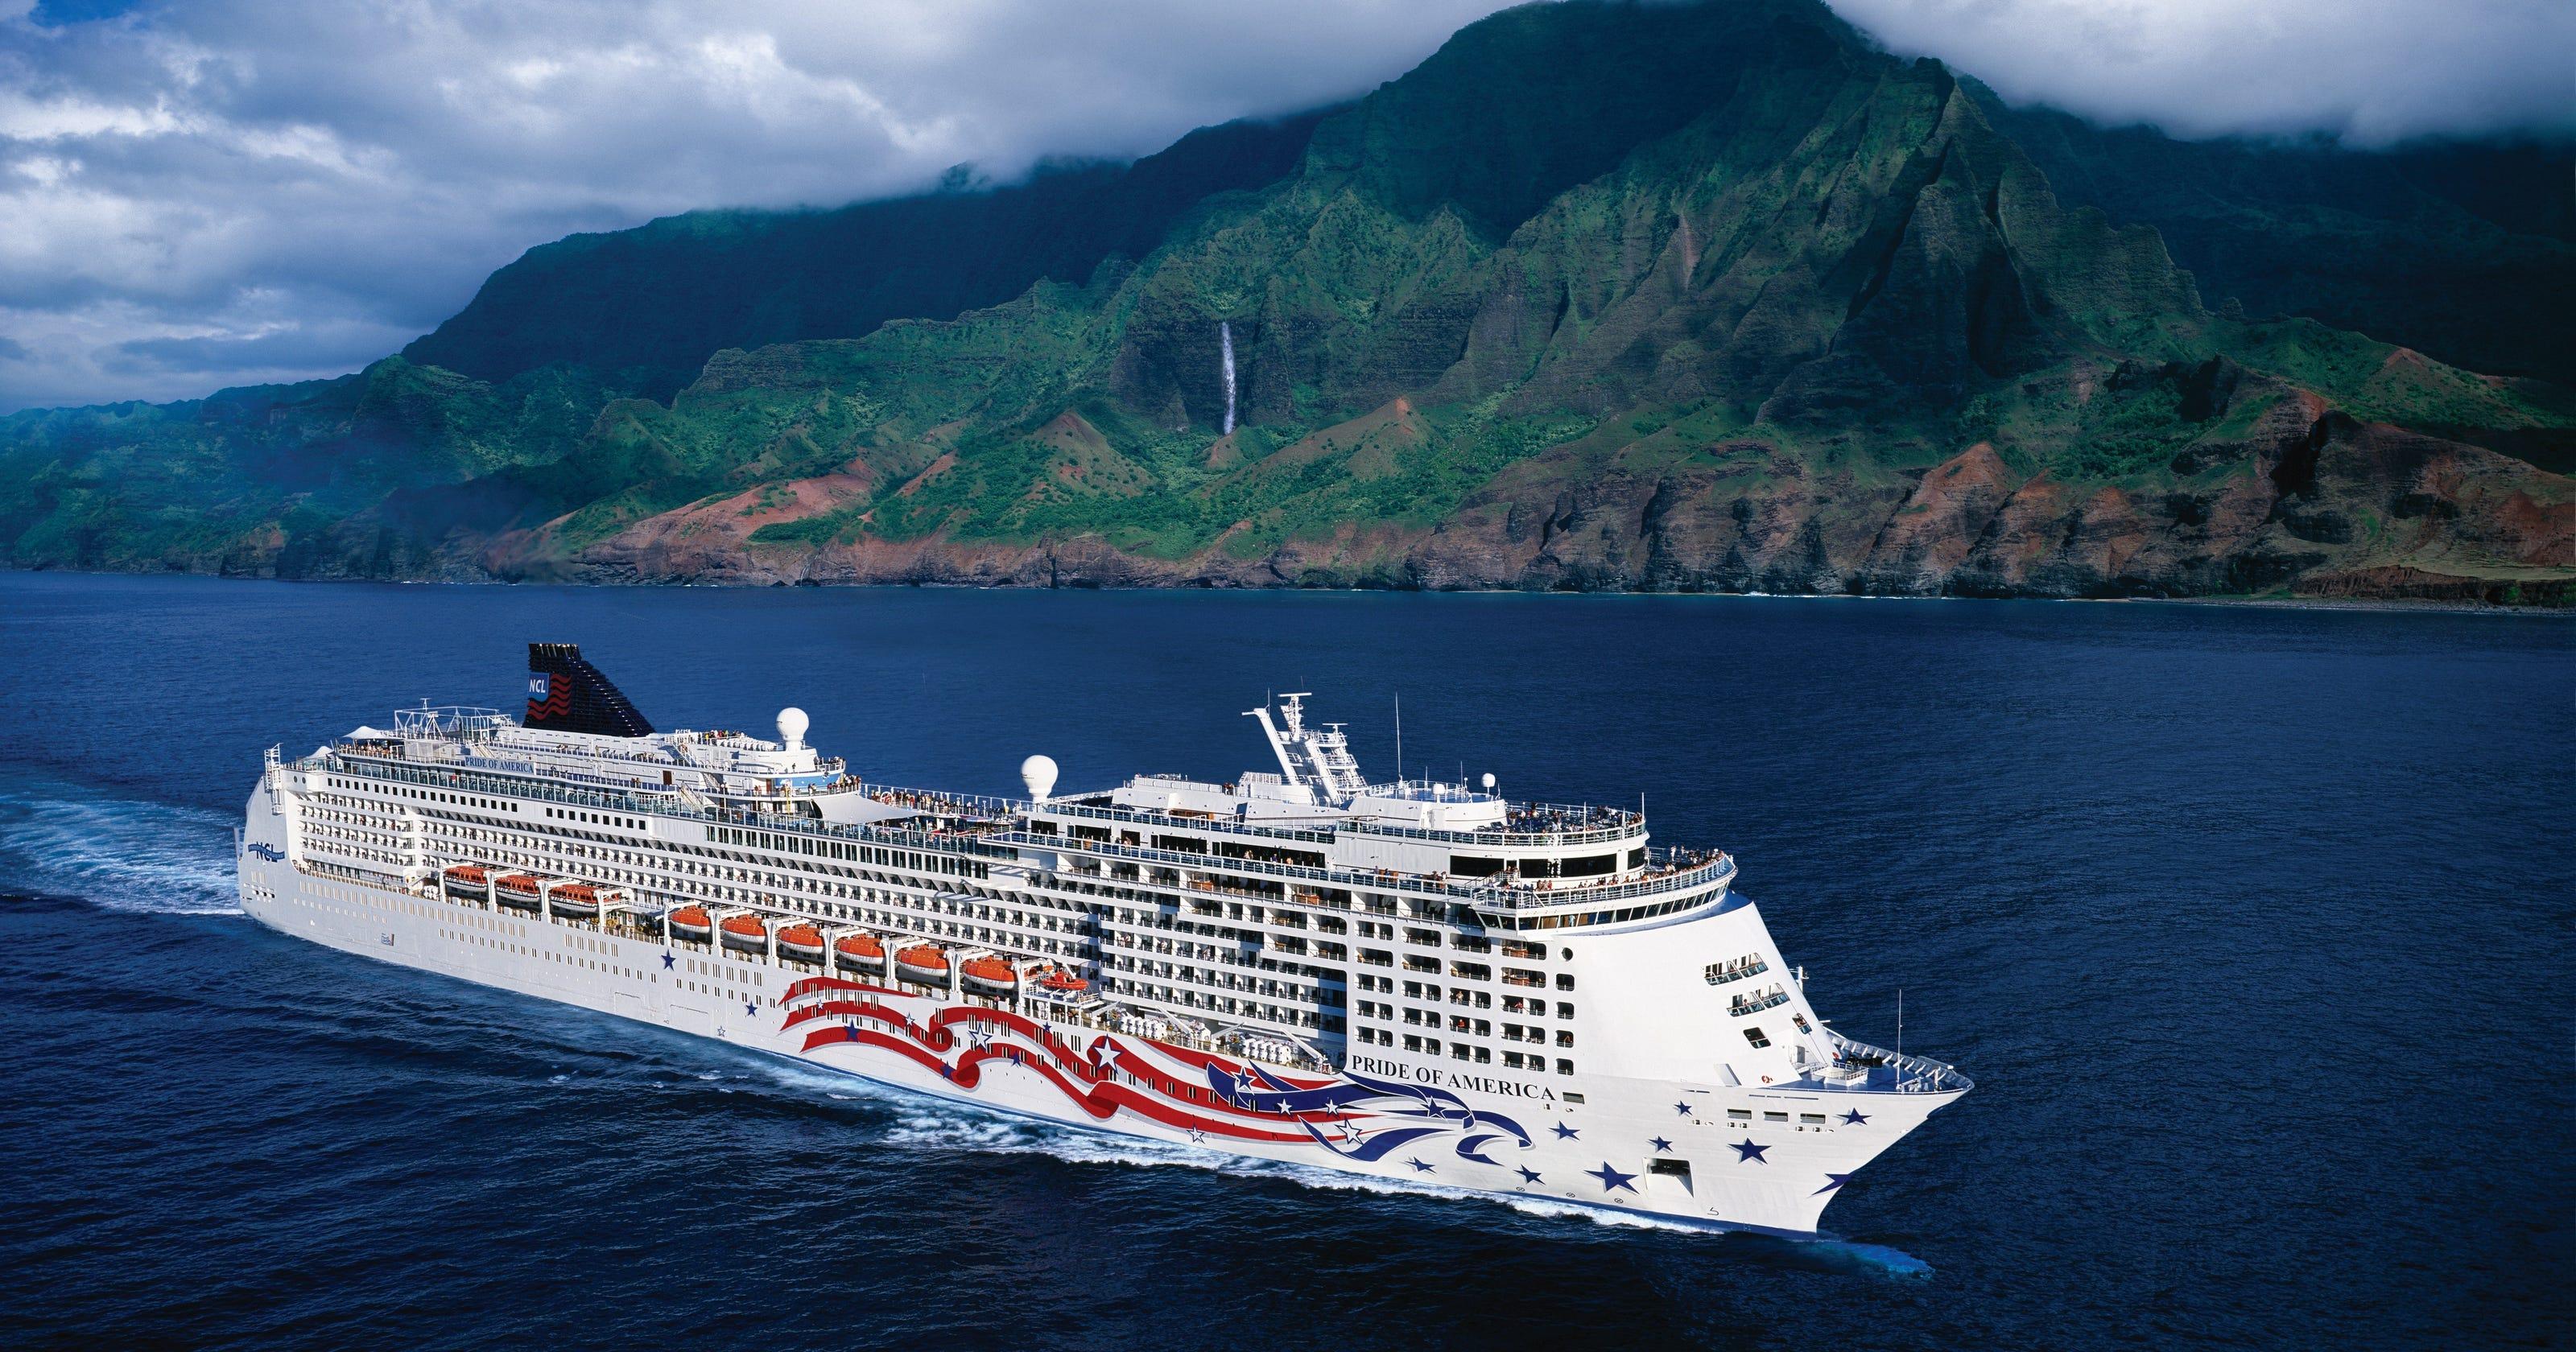 Cruise ship tours: Inside Norwegian Cruise Line's Pride of America, icon of Hawaii cruises